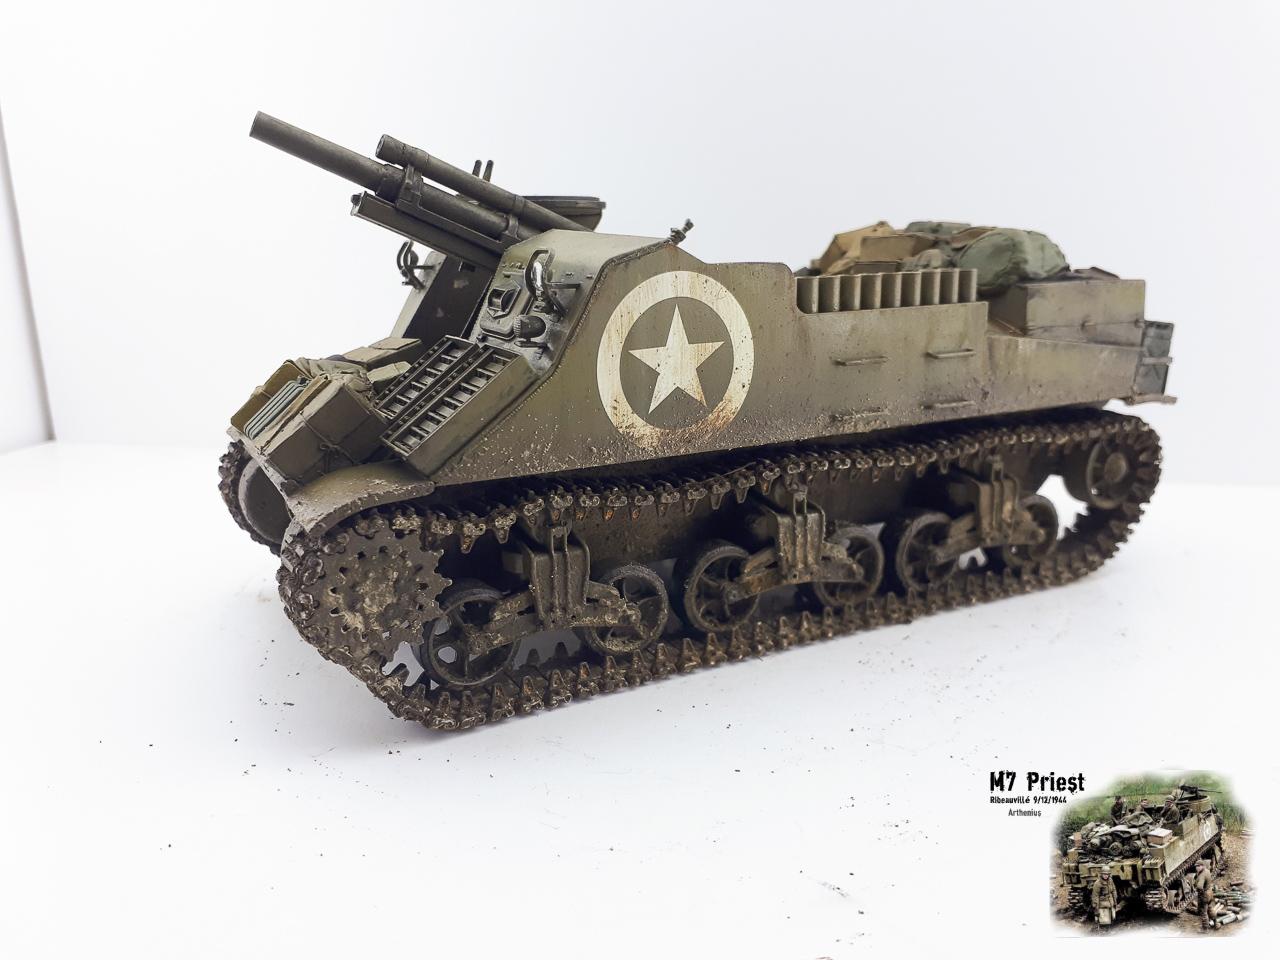 M7 Priest Ribeauvillé 9/12/1944 - Page 3 2018-112